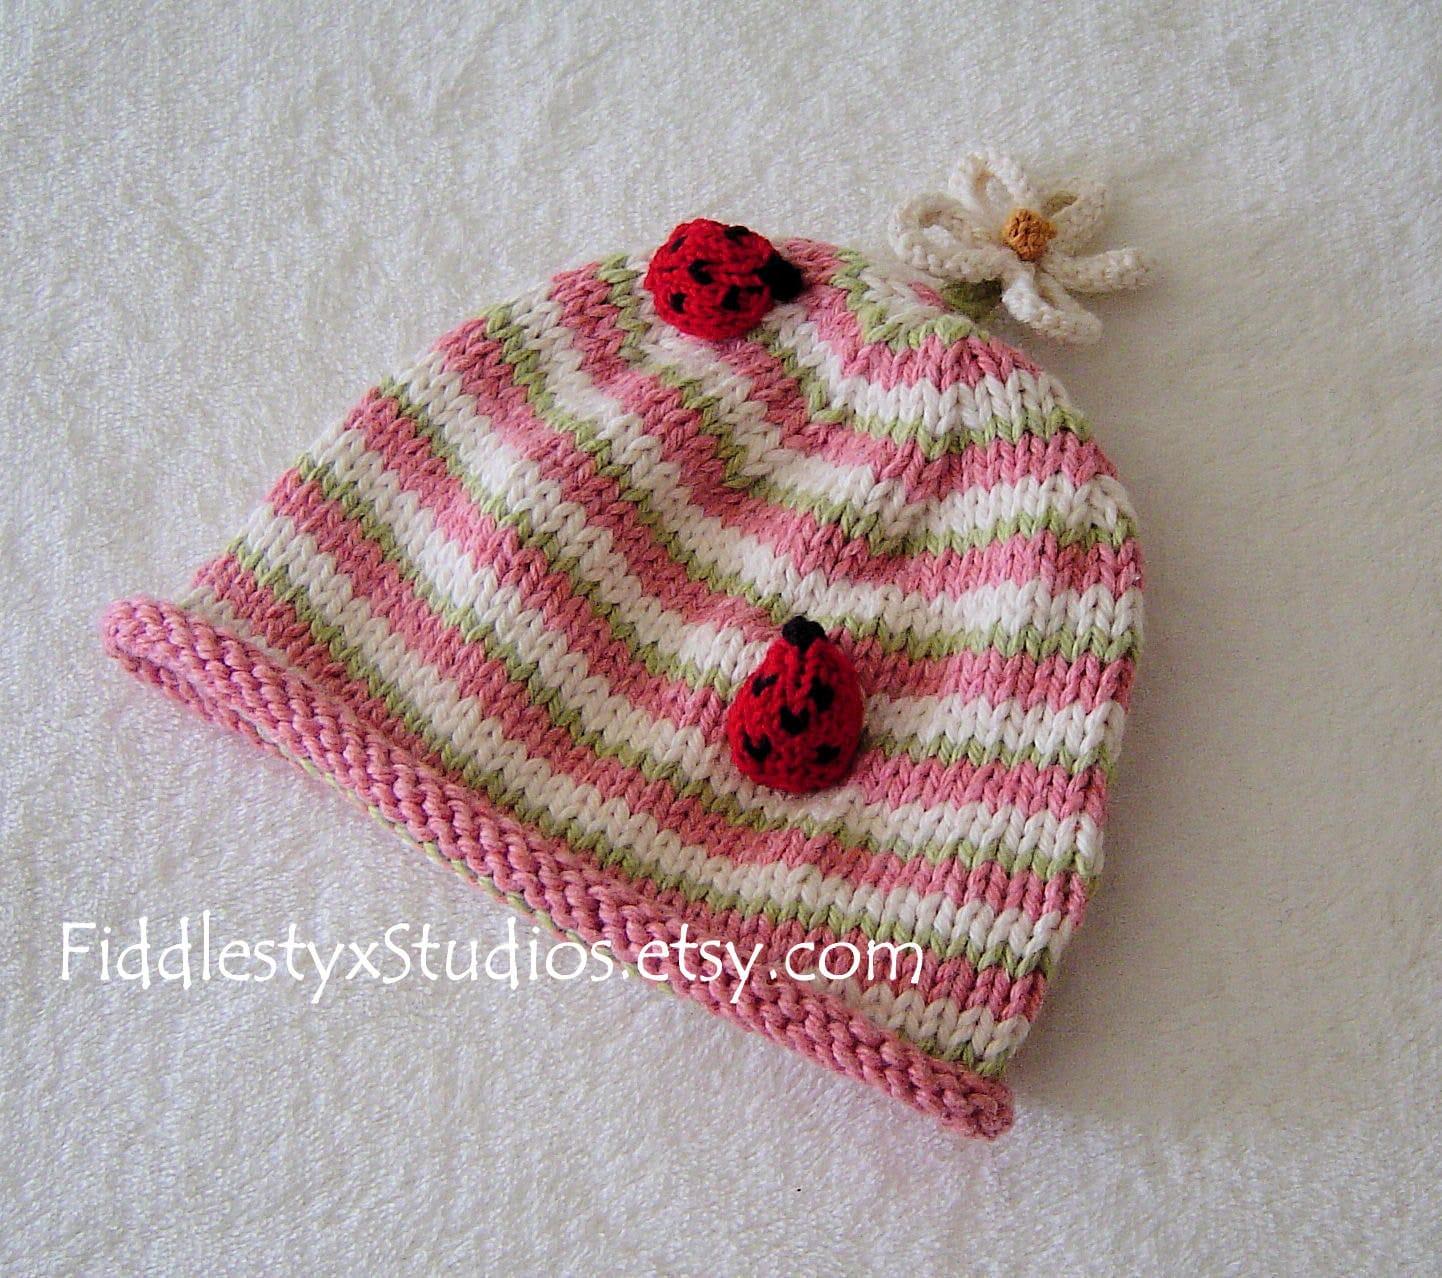 Spring Baby Girl Knitting Pattern Ladybug Pink Knitted Hat Easter Newborn Infant Toddler DIY PDF Knit Hat Pattern Kids Children Clothing